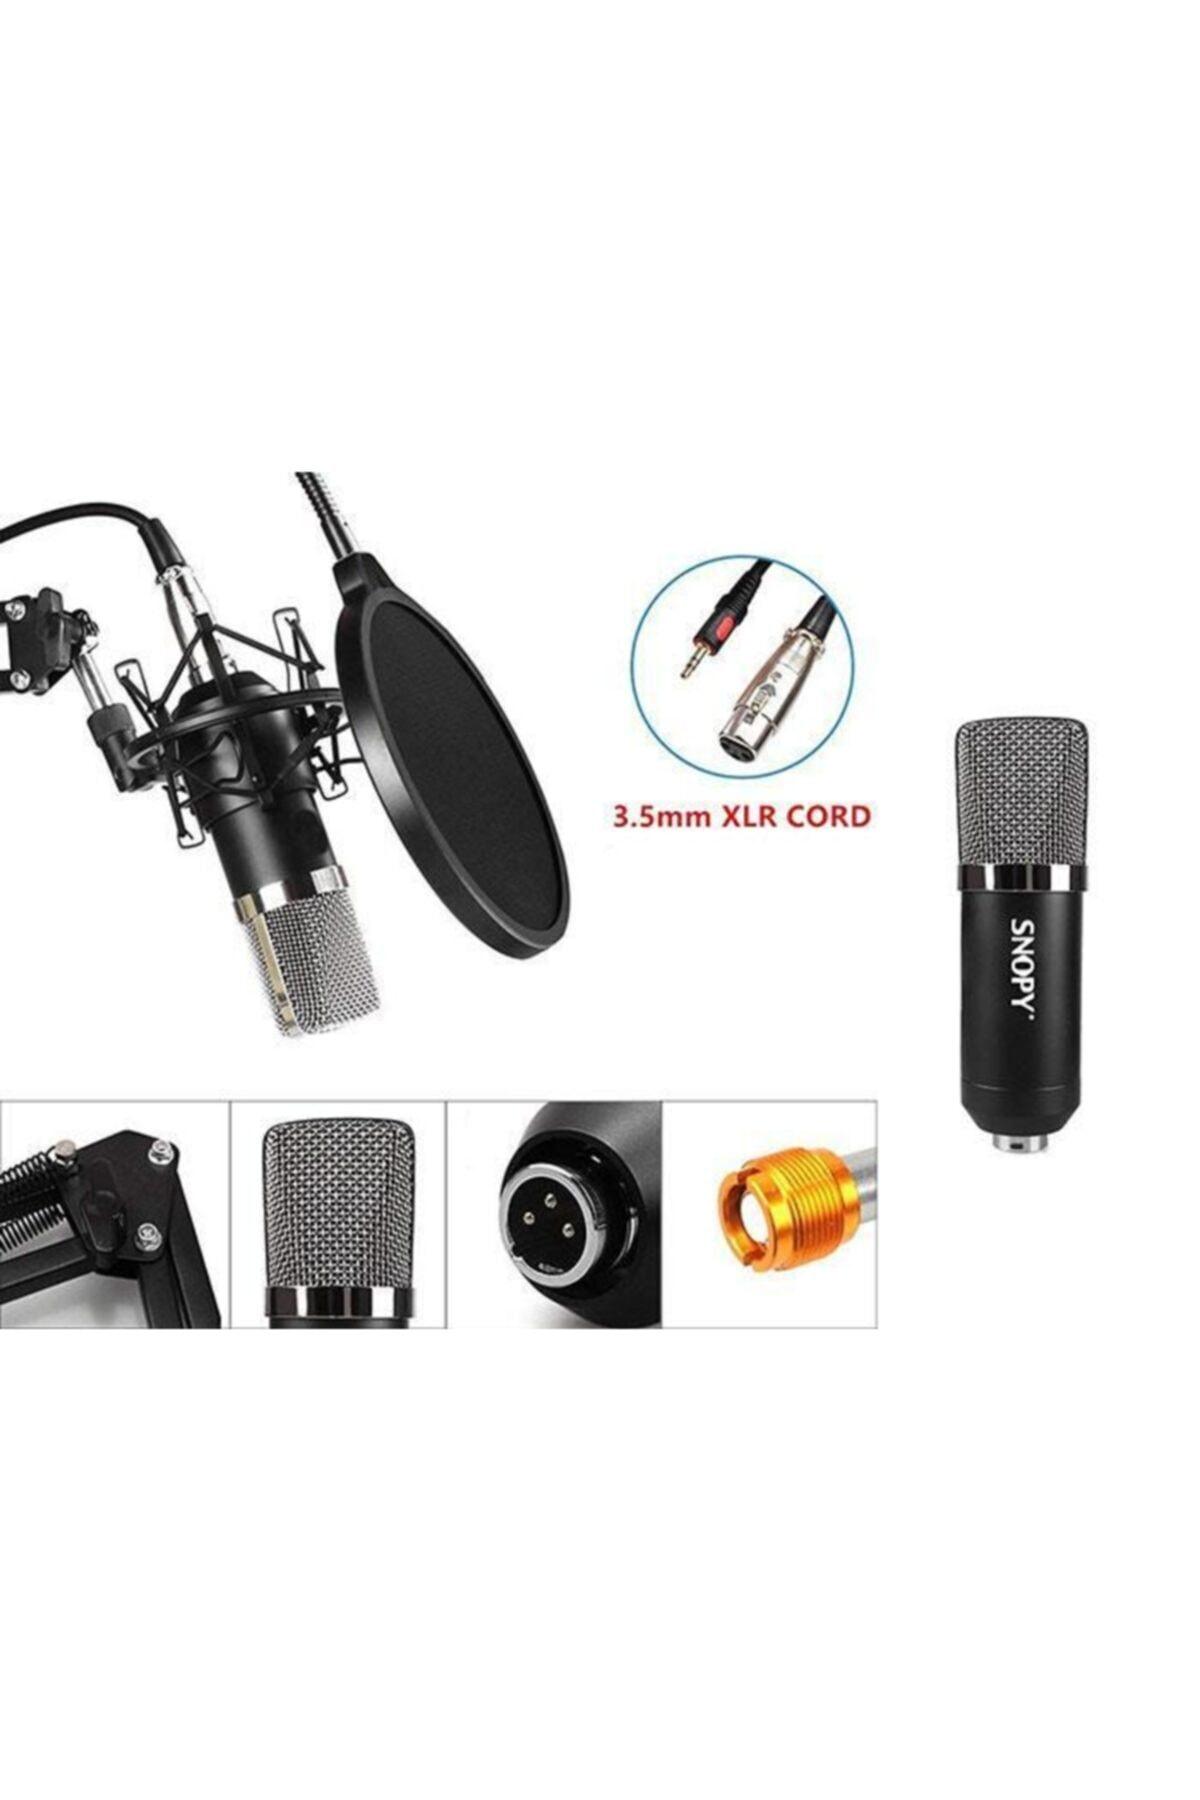 Snopy Sn-03p Profesyonel Stand Ve Filtreli Youtuber Ve Masaüstü Mikrofon 2